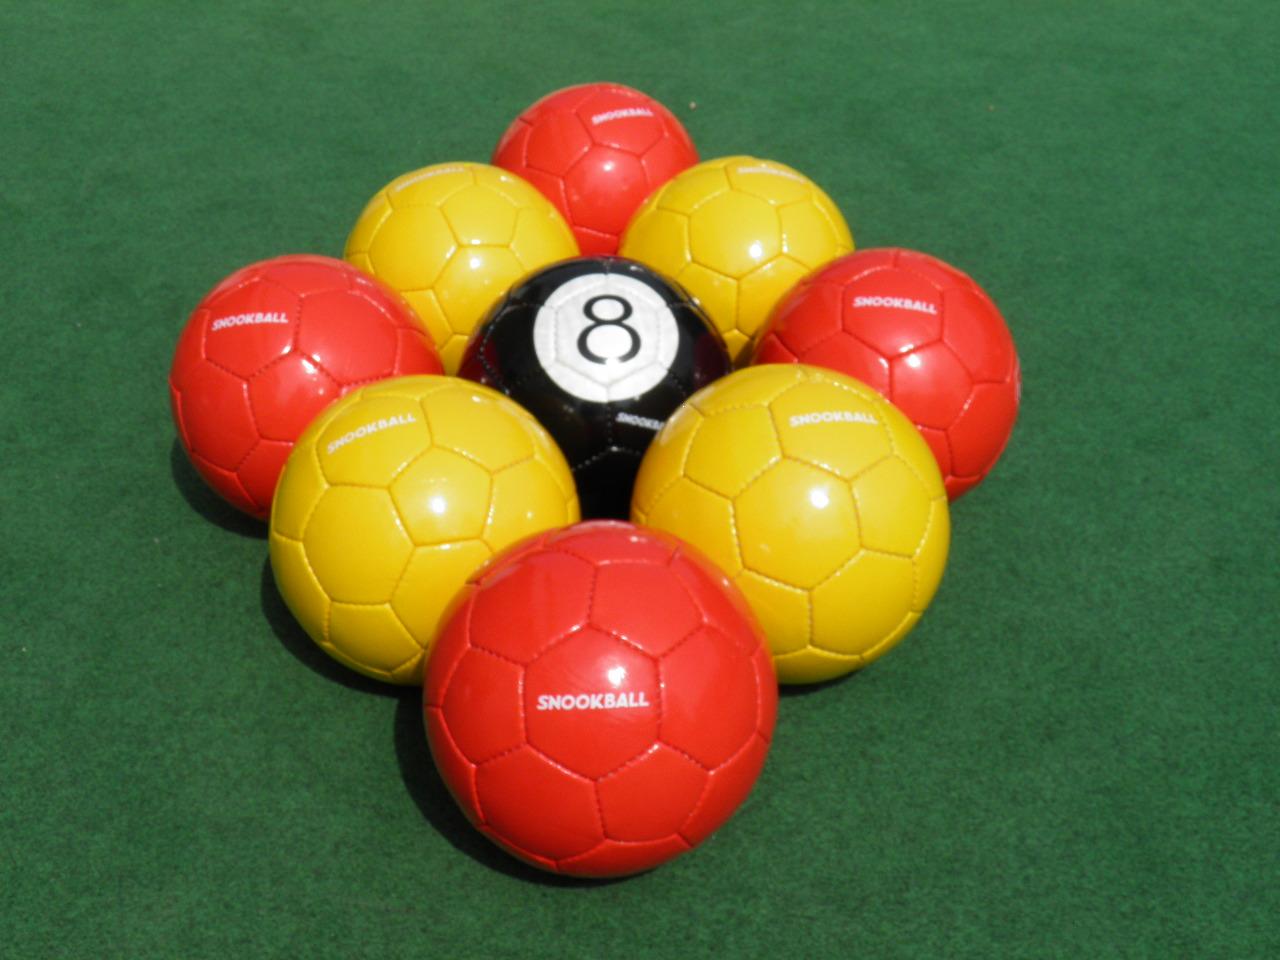 pool 9 balls